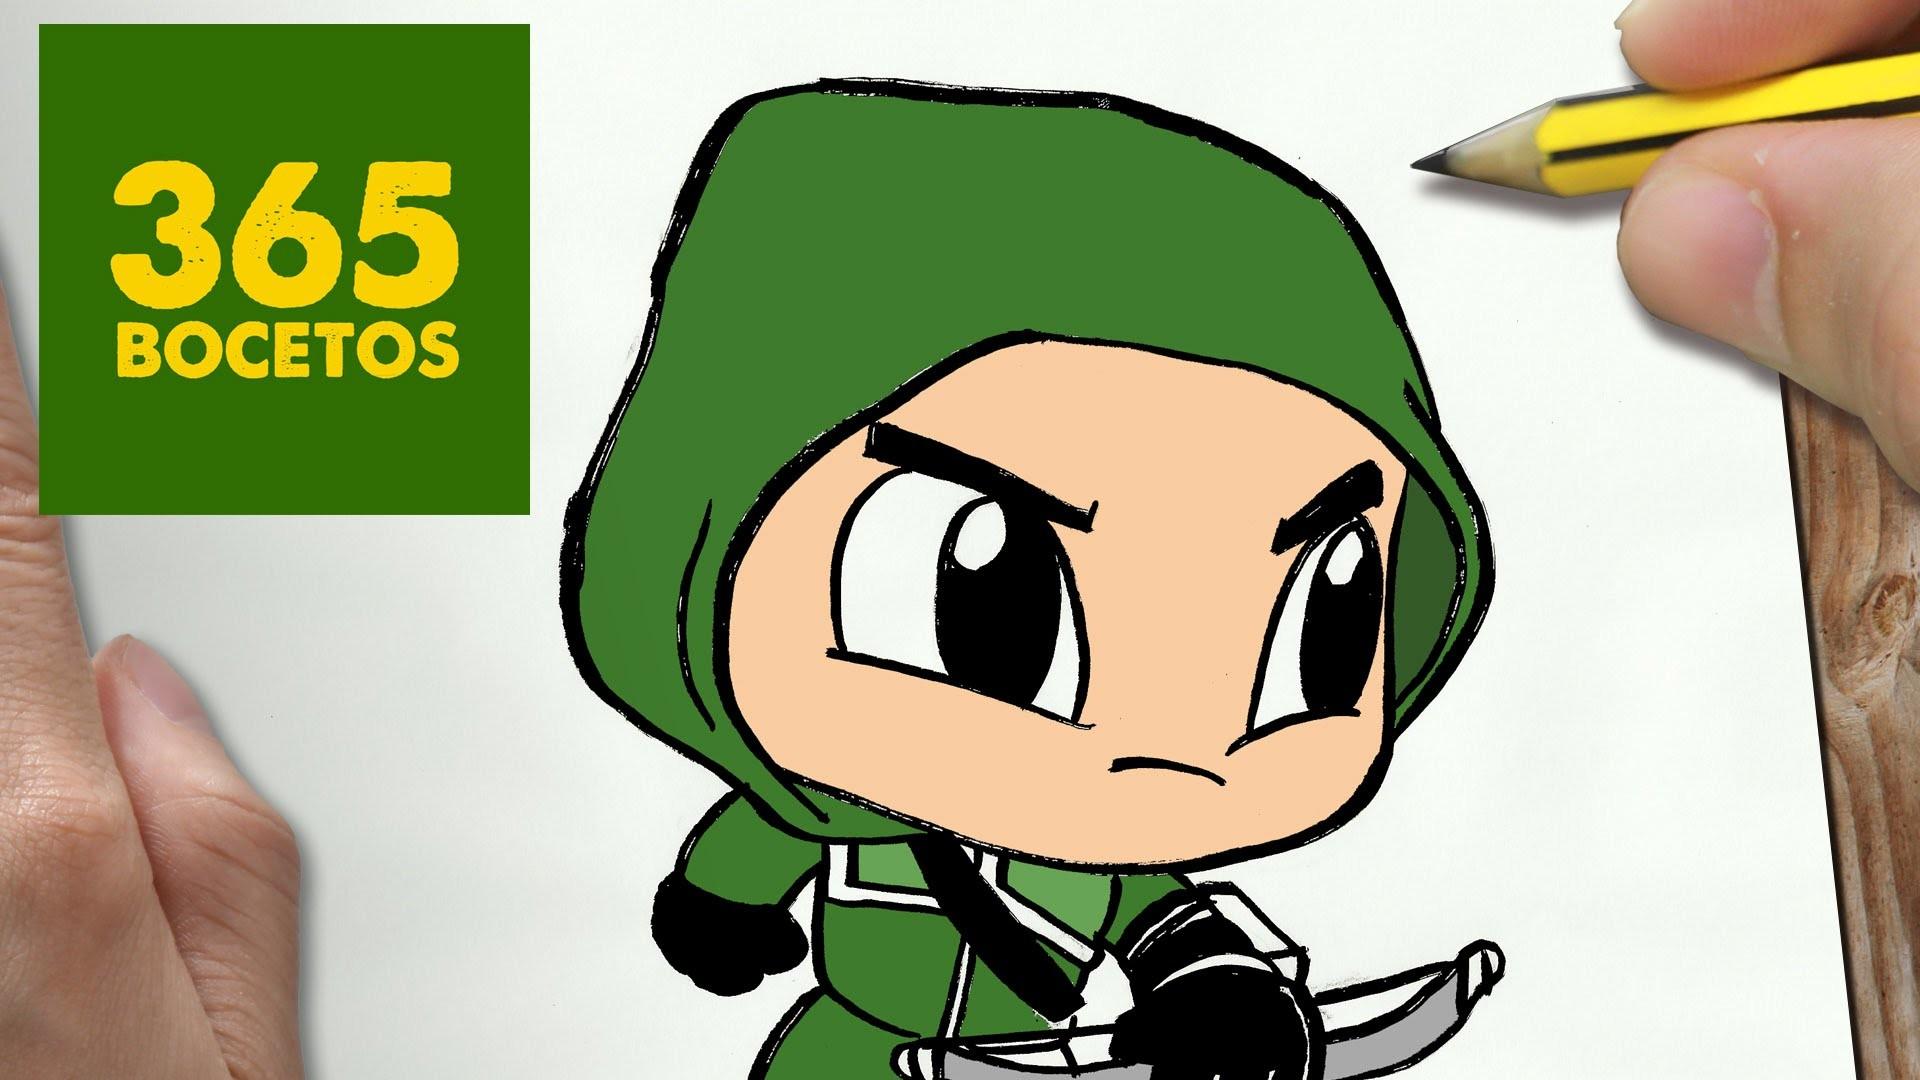 Como Dibujar Una Libreta Kawaii Paso A Paso Dibujos Kawaii: COMO DIBUJAR ARROW KAWAII PASO A PASO